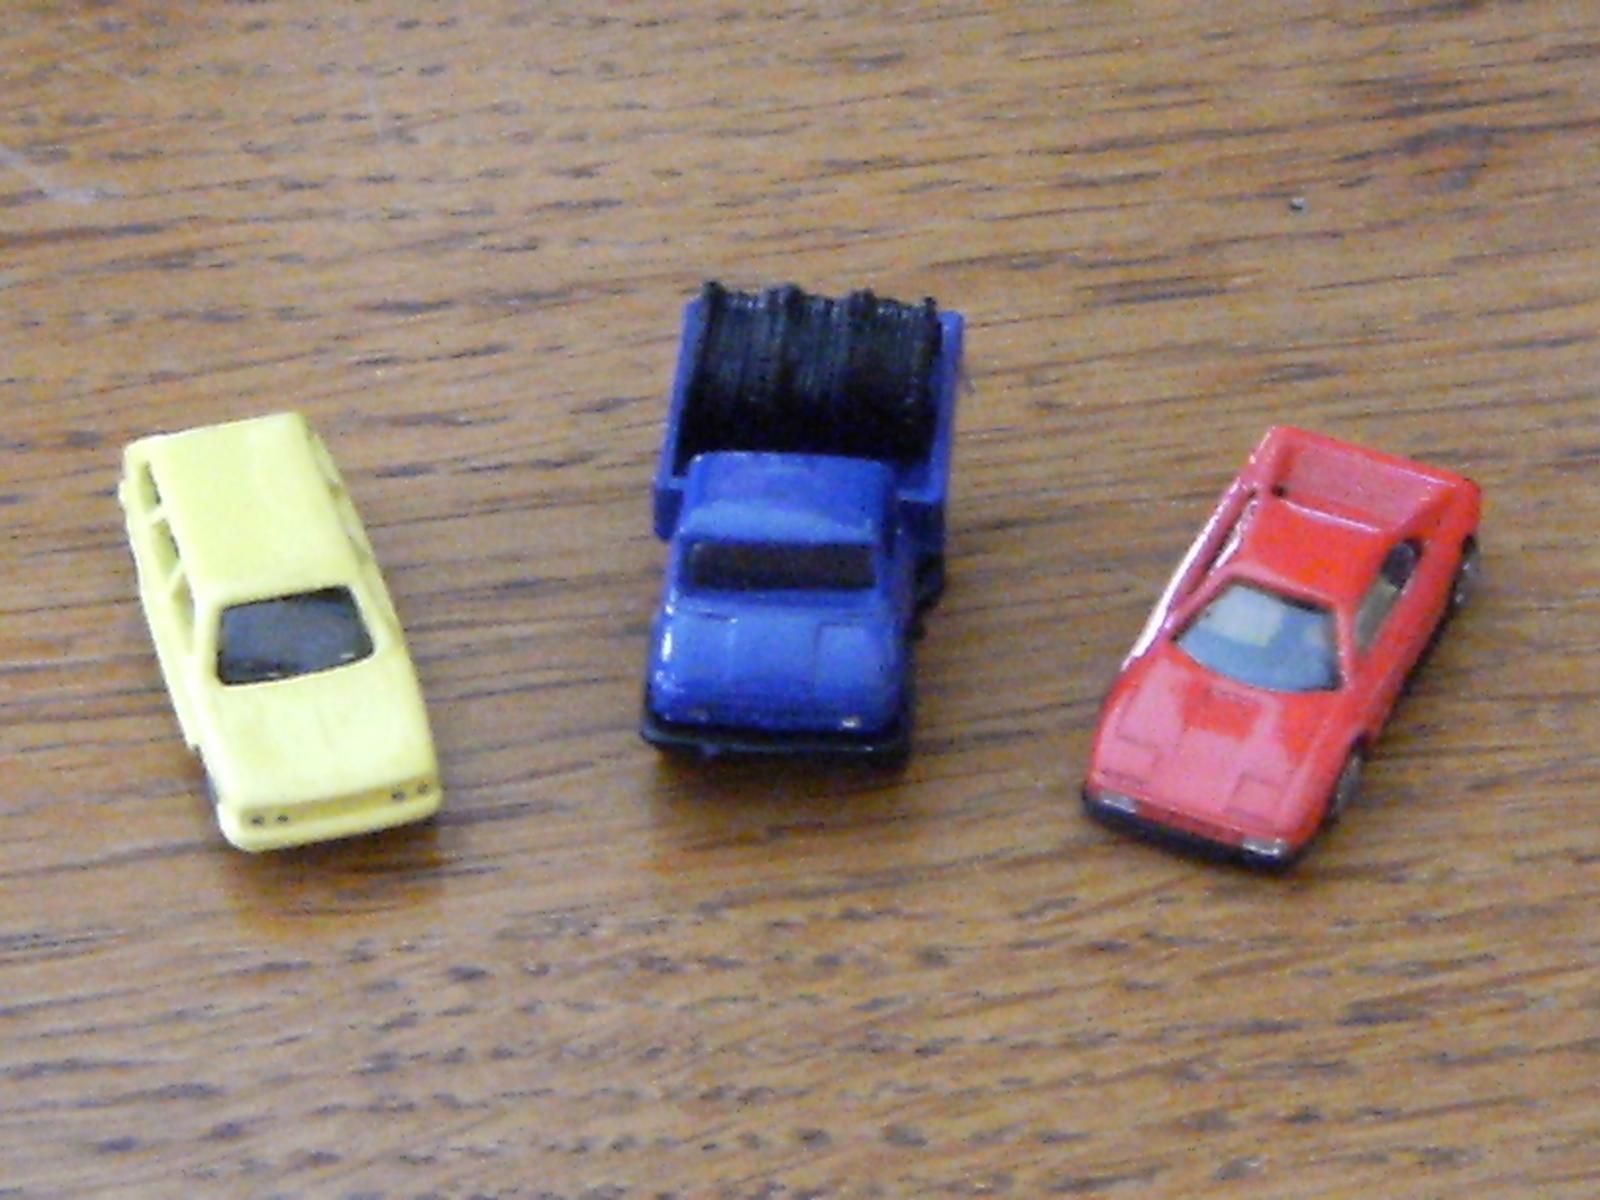 660160137_K1600_cars_122_433lo.JPG